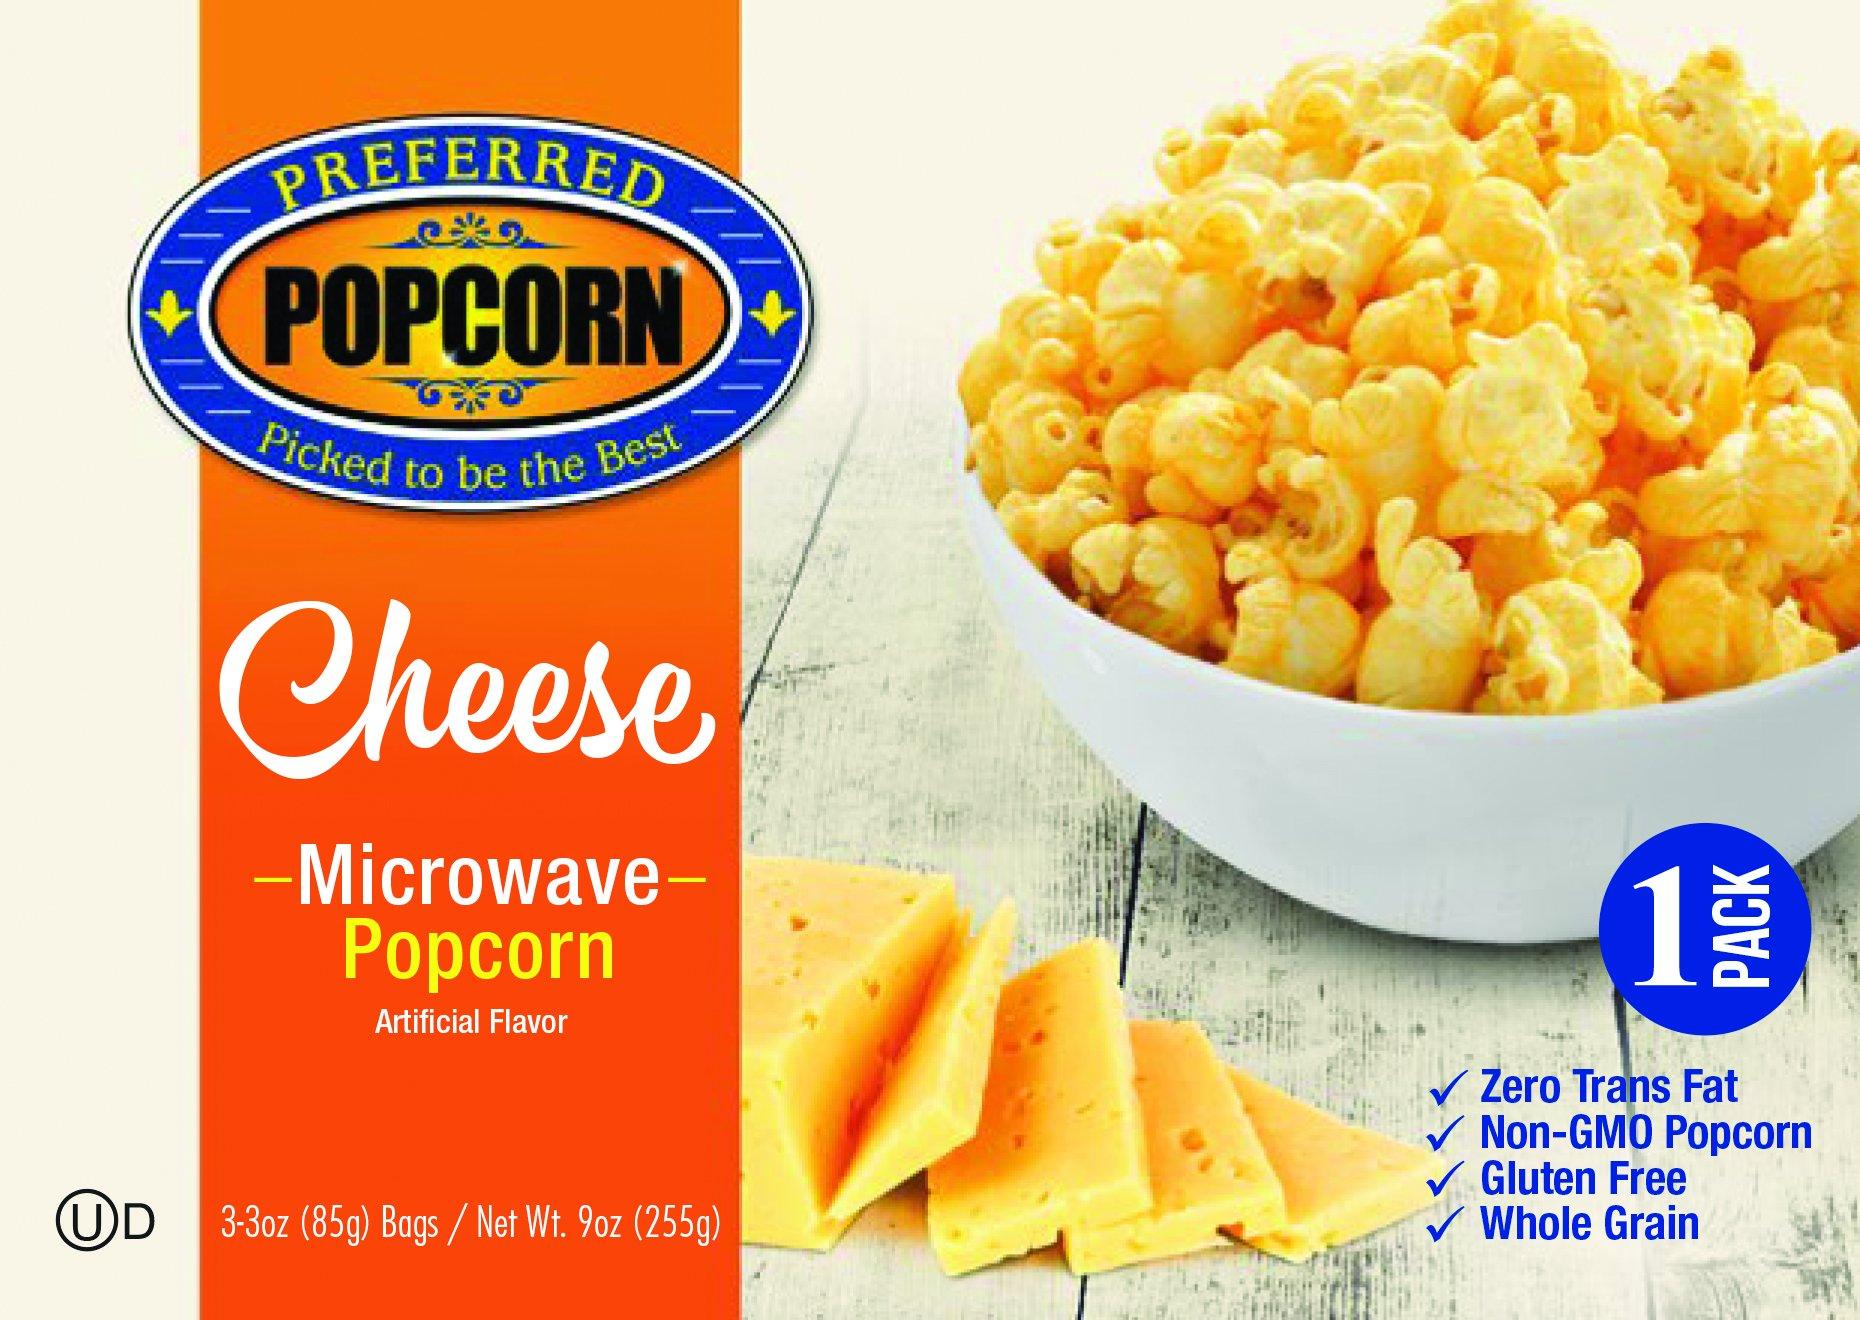 Microwave Cheese Popcorn - Preferred Popcorn - 100% Farmer Owned - Non GMO - Gluten Free - Whole Grain - One 3.0 oz Bag - Made in USA - Made in Nebraska - Real Cheese Flavor - Cheesy Snack by Preferred Popcorn (Image #1)